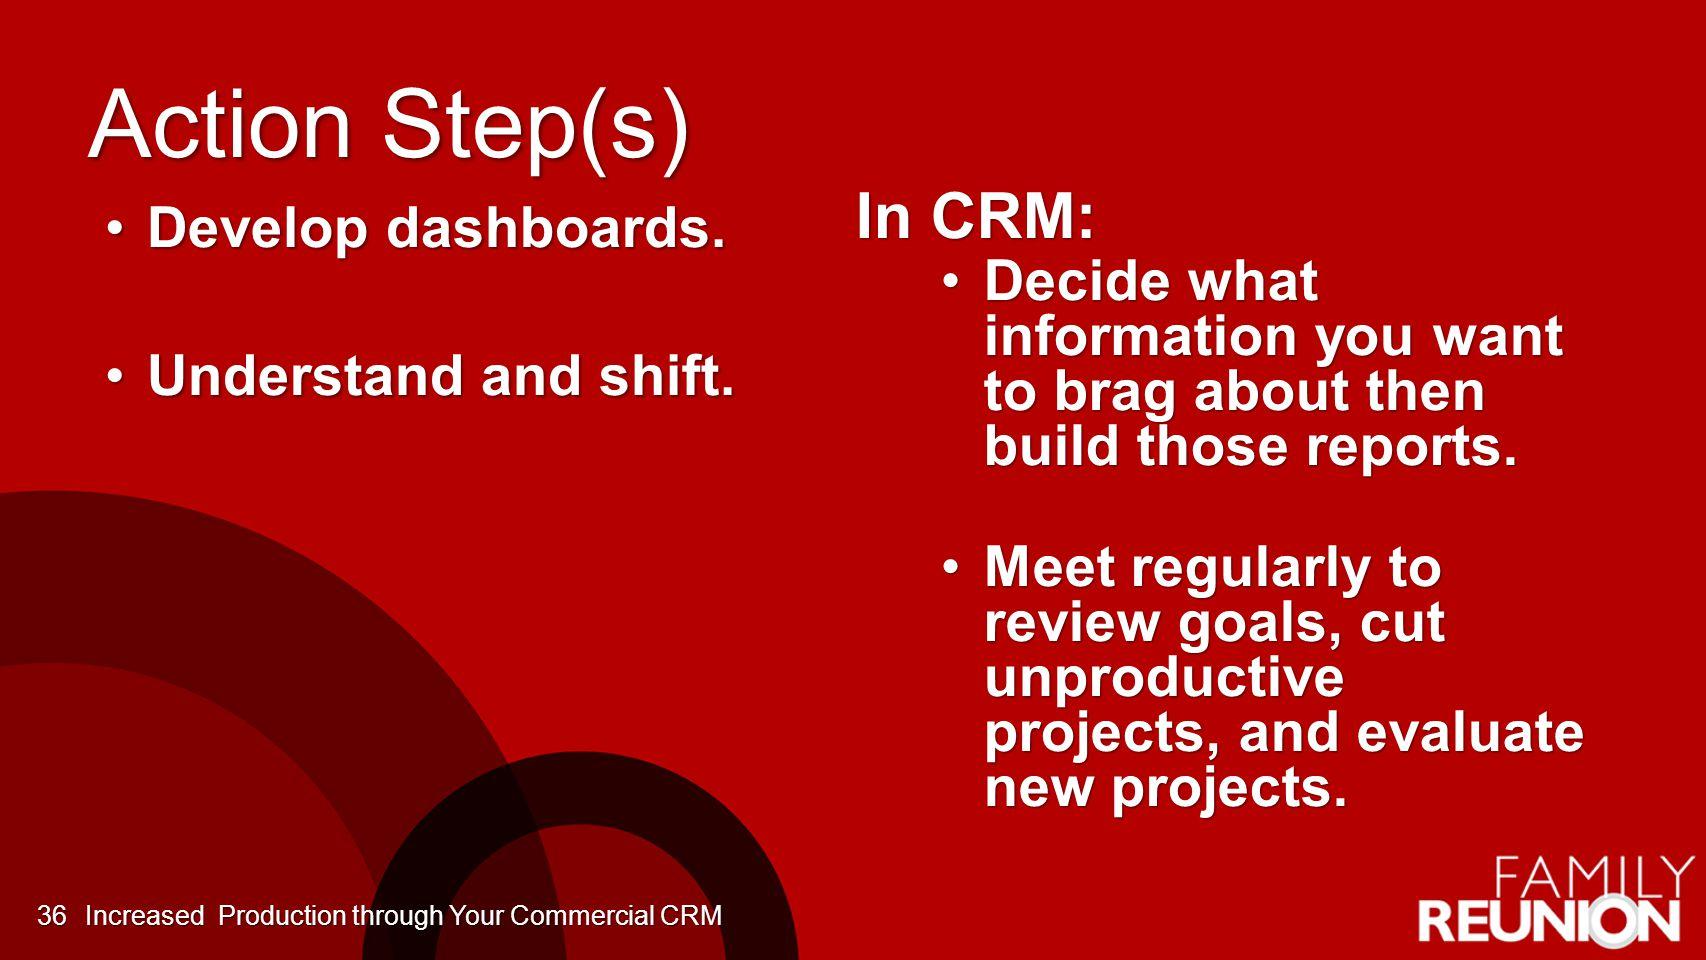 Action Step(s) Develop dashboards.Develop dashboards.